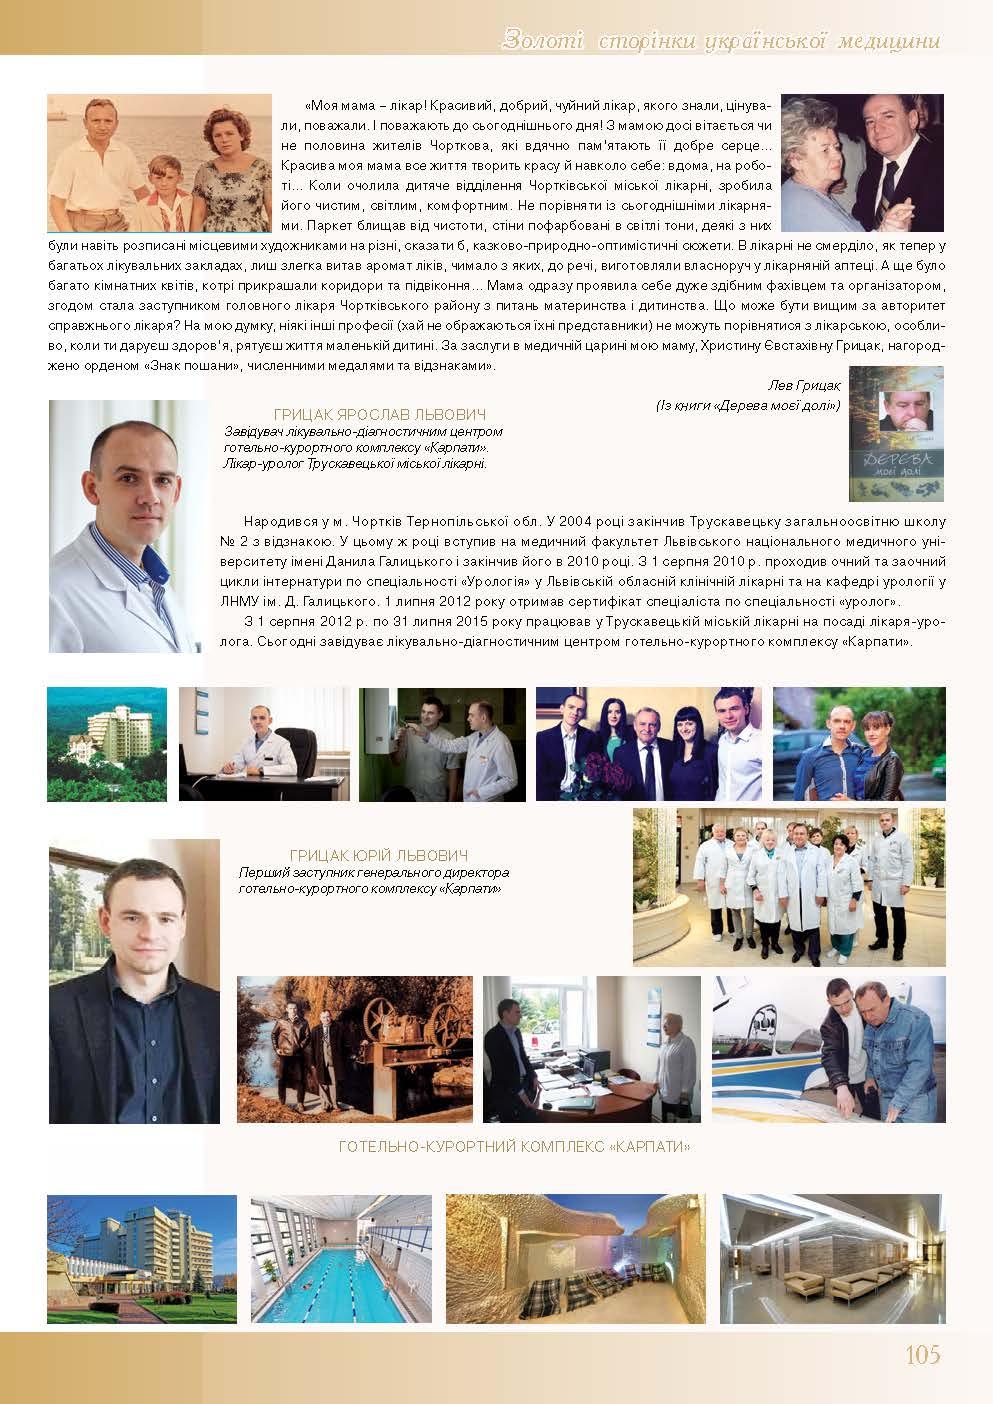 Медична династія Грицак